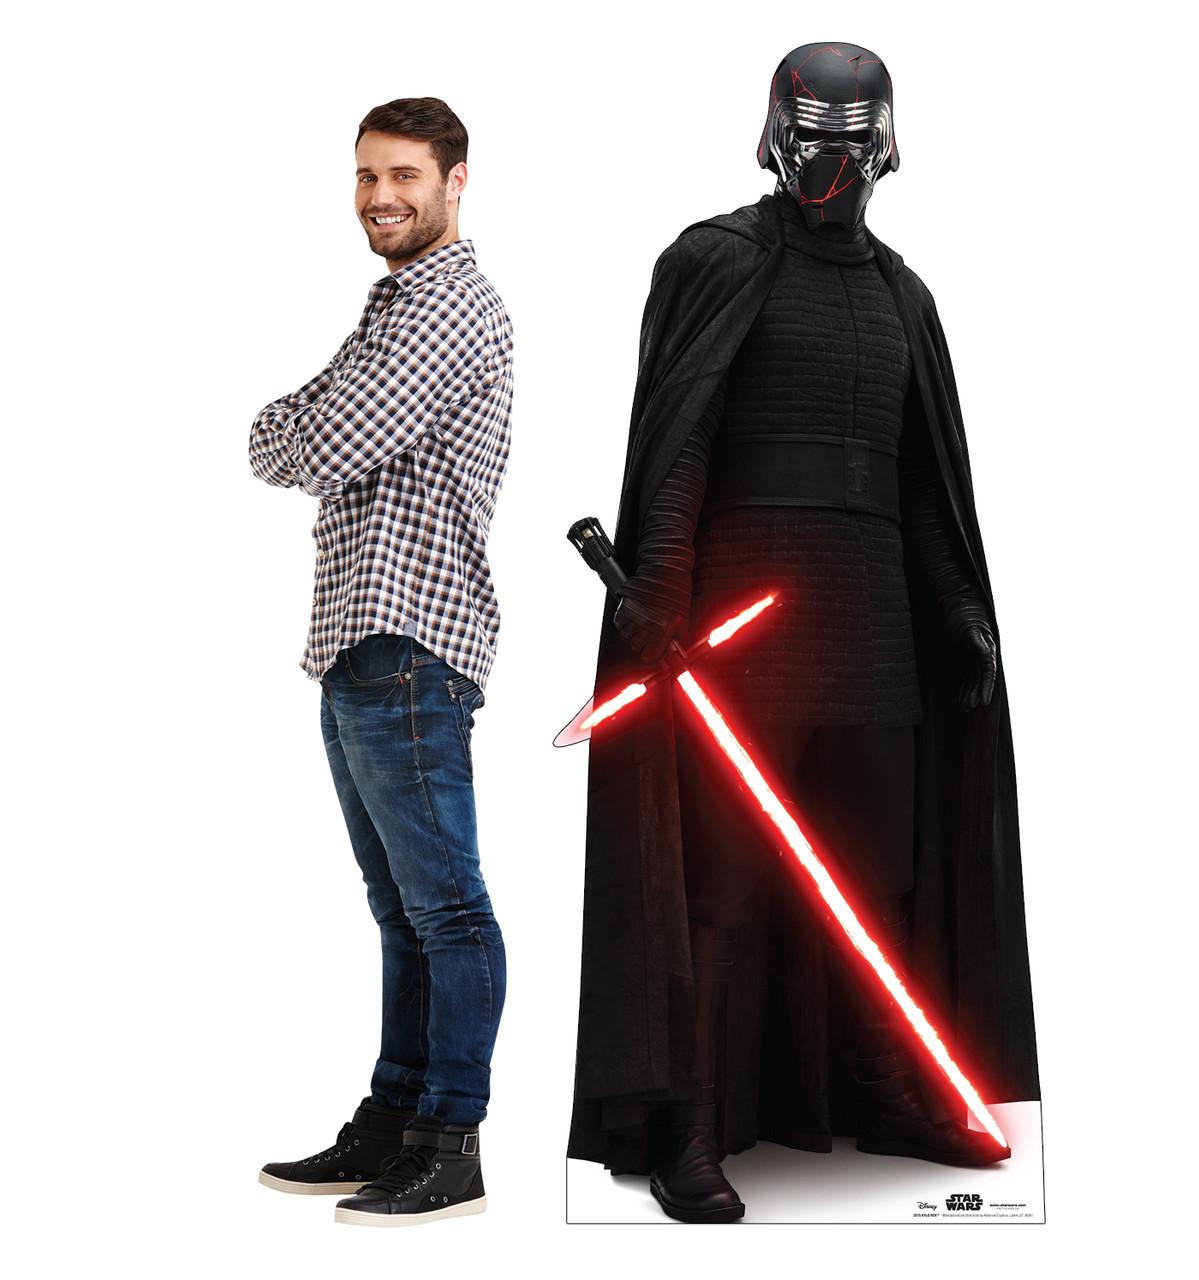 Life-size cardboard standee of Kylo Ren™ (Star Wars IX) with model.